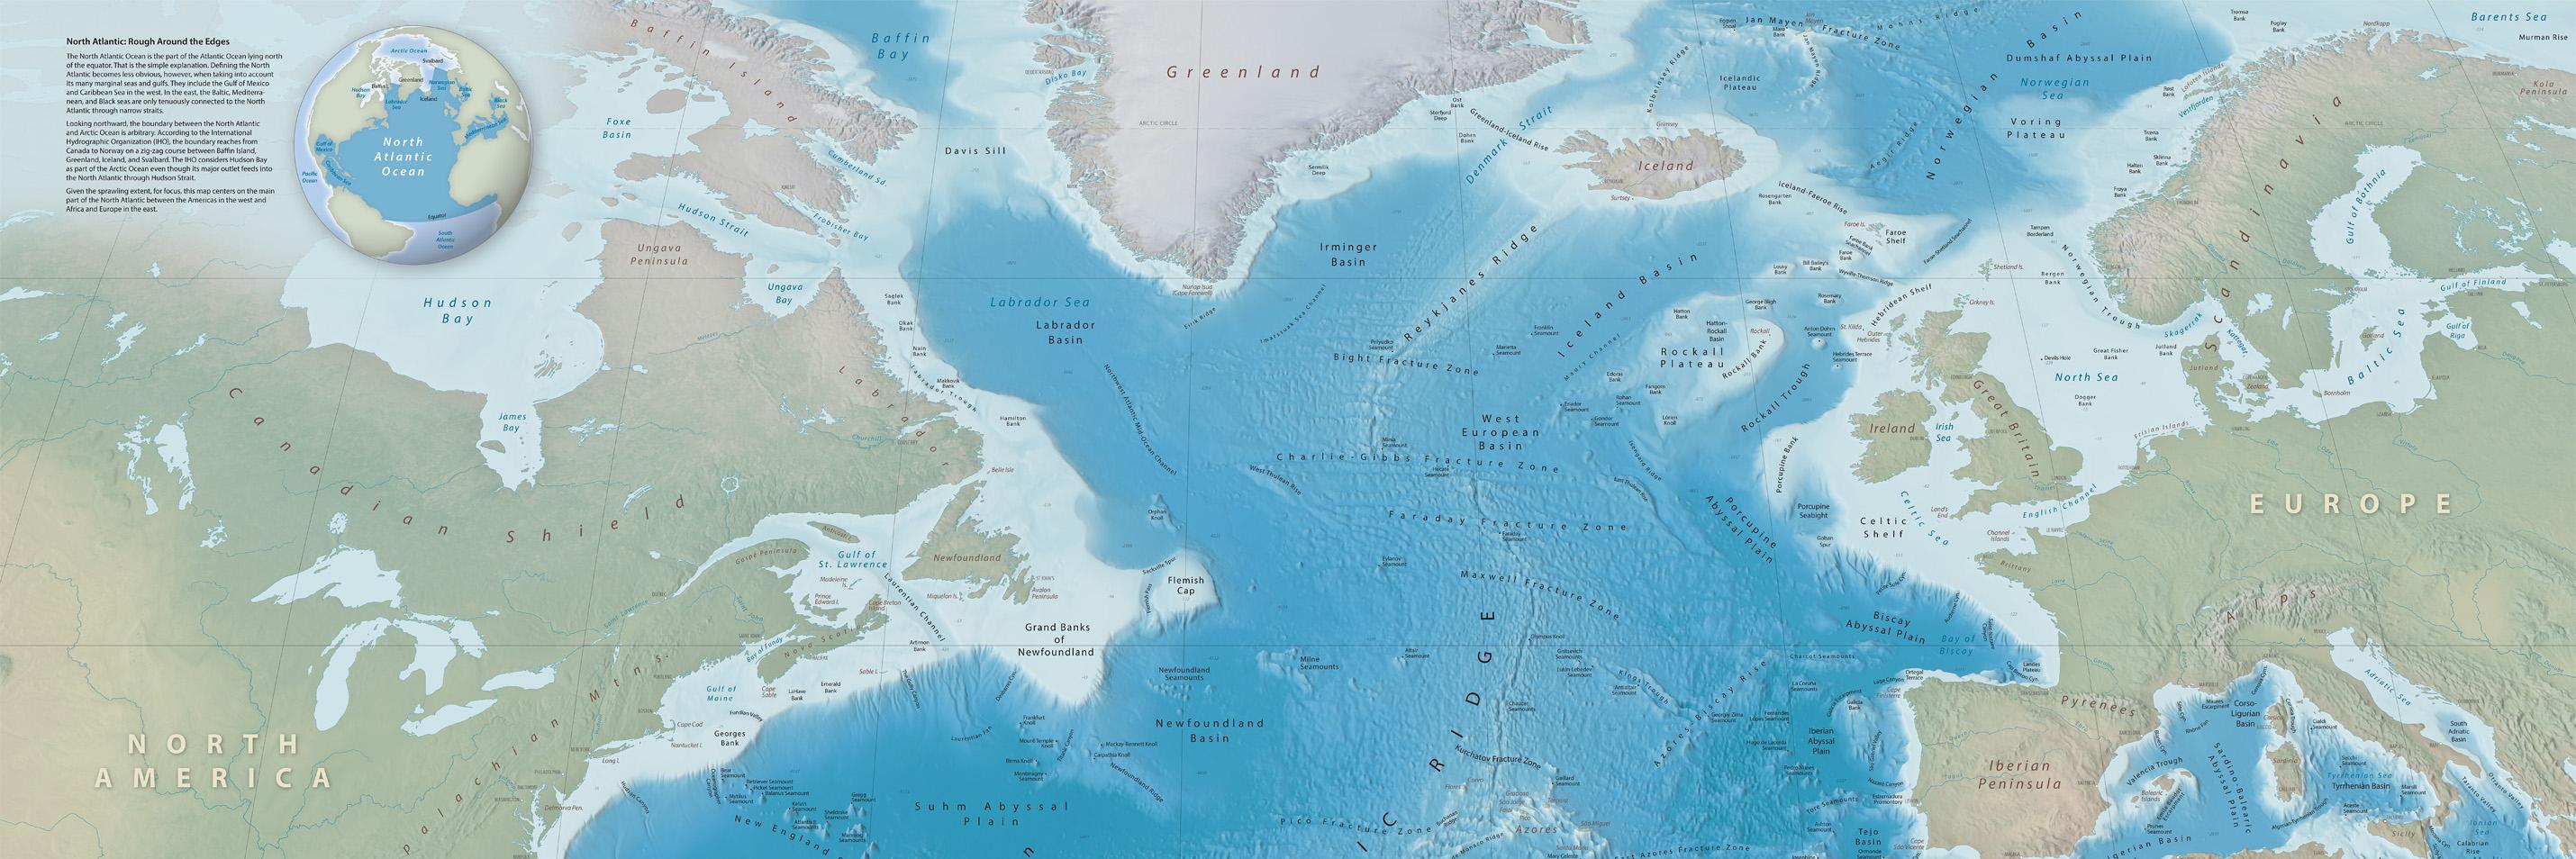 North Atlantic Seafloor Map